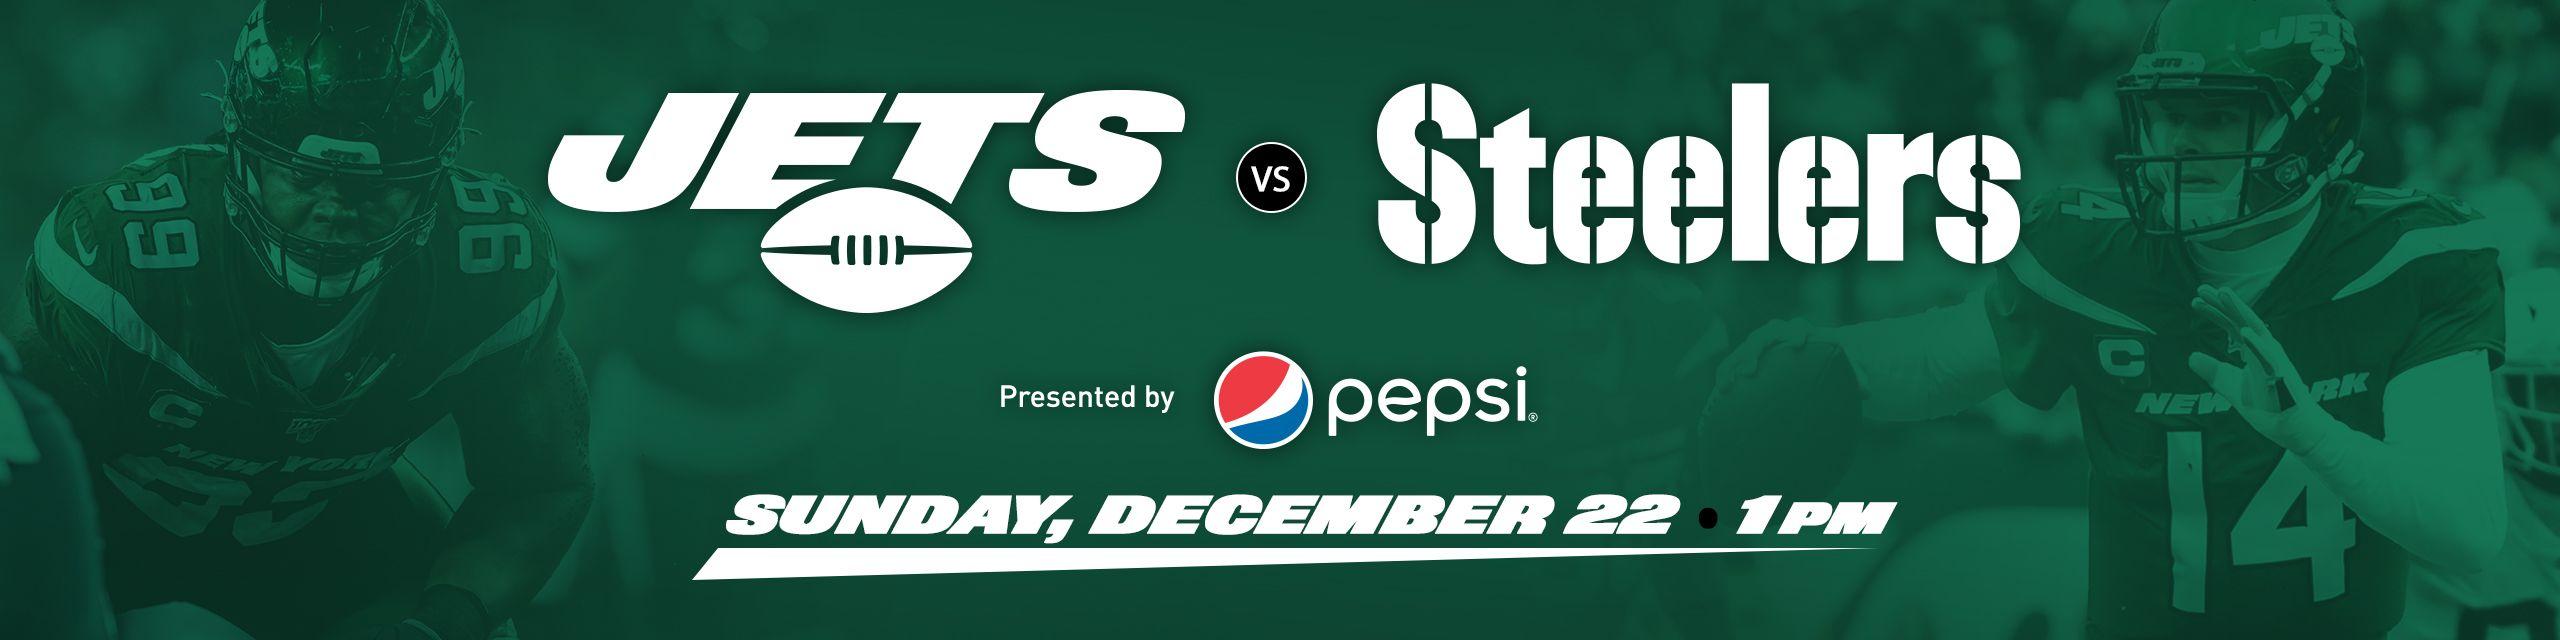 Jets-Steelers-Header